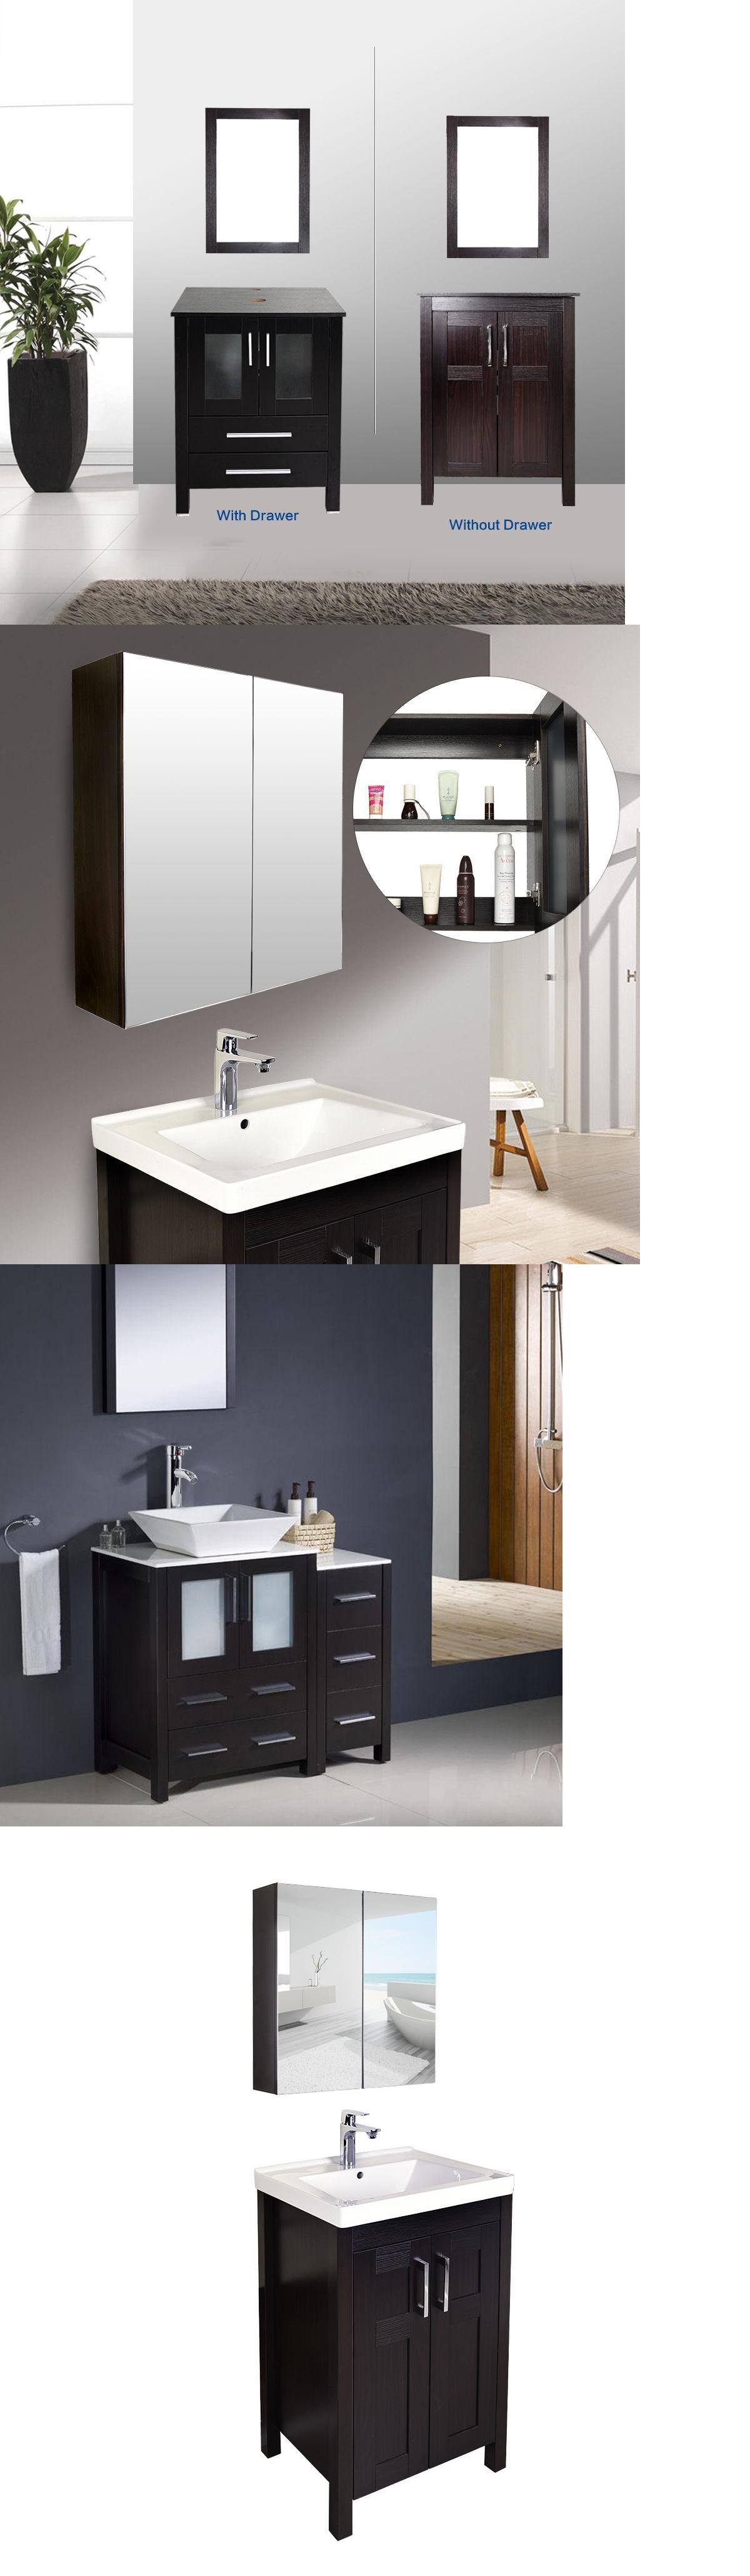 Vanities Bathroom Vanity Top Cabinet Wood Bowl Vessel